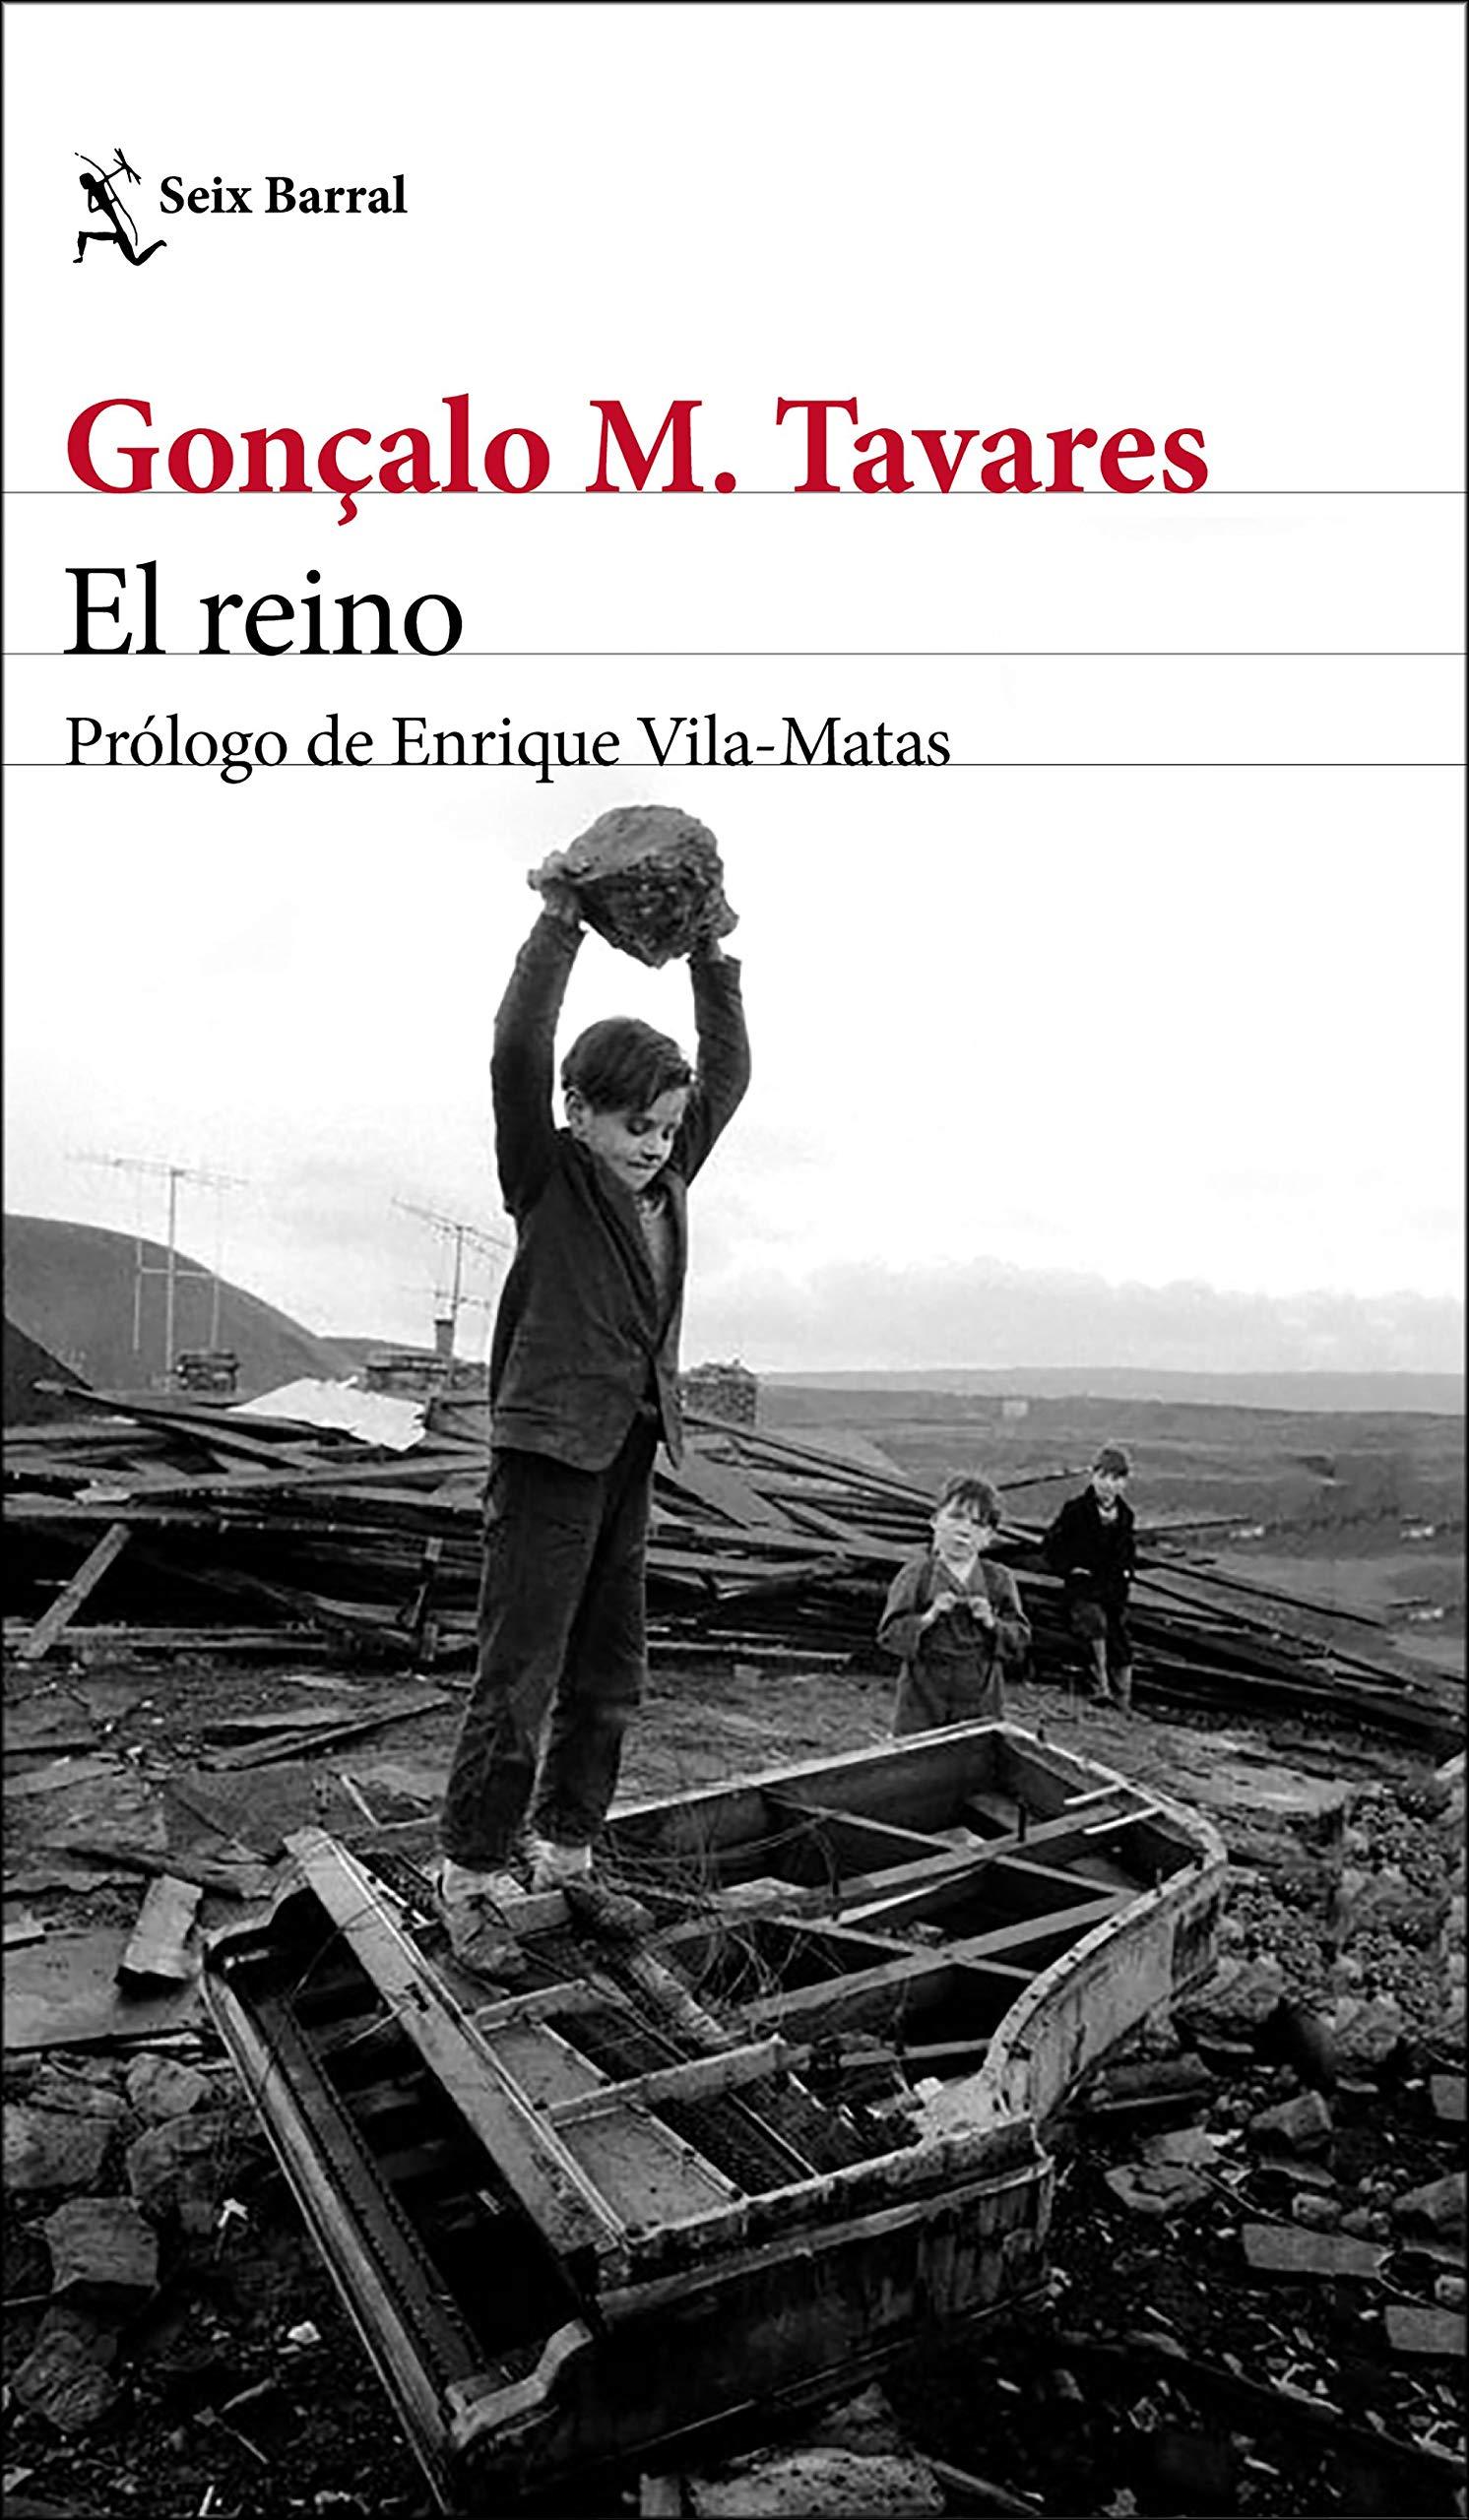 El reino: Prólogo de Enrique Vila-Matas Biblioteca Formentor: Amazon.es: Gonçalo M. Tavares, Rita Da Costa: Libros